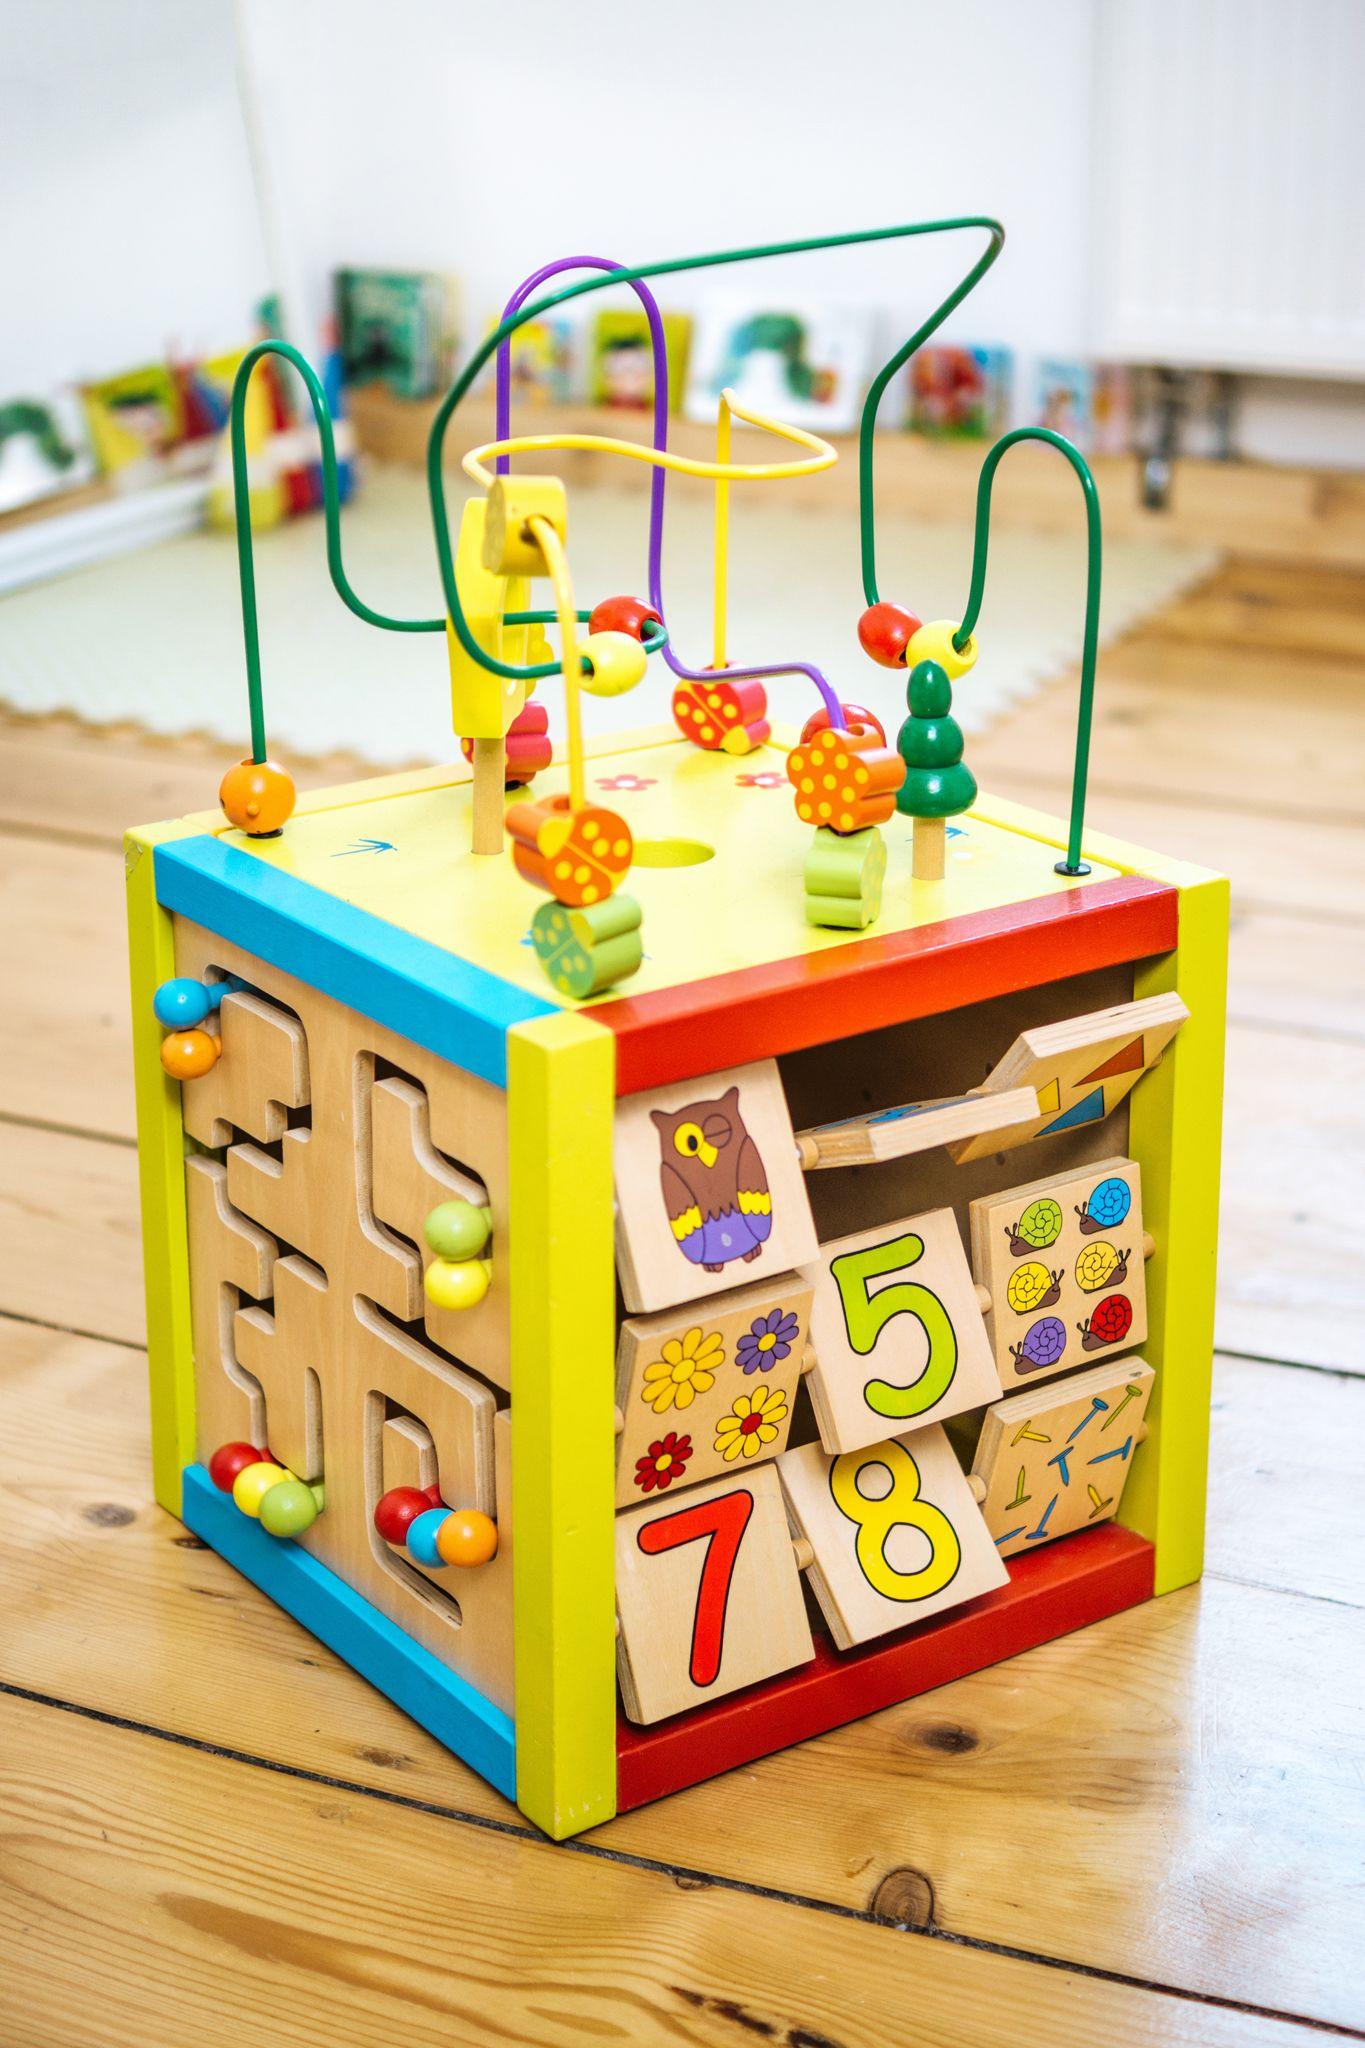 Spielzeug Fã R 2 Monate Altes Baby